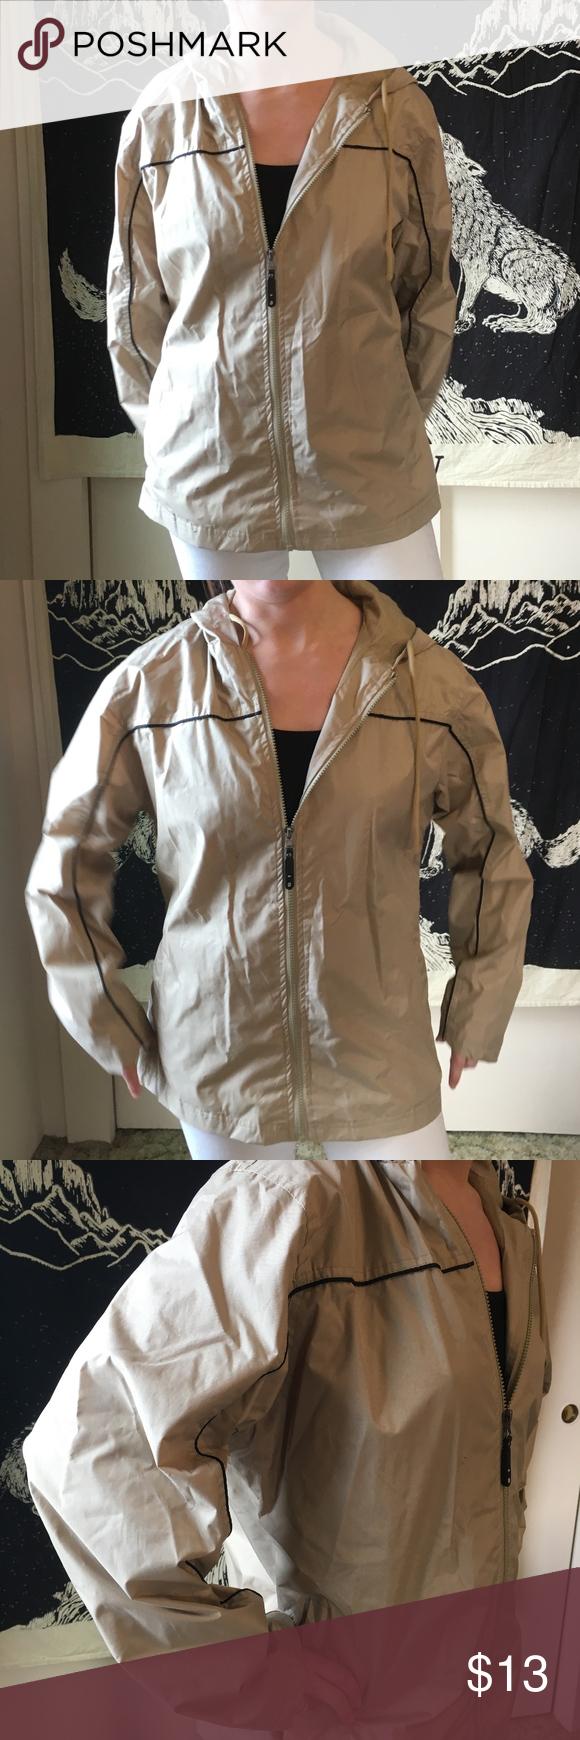 Waterproof I5 Hooded Rain Jacket Hooded Rain Jacket Rain Jacket Jackets